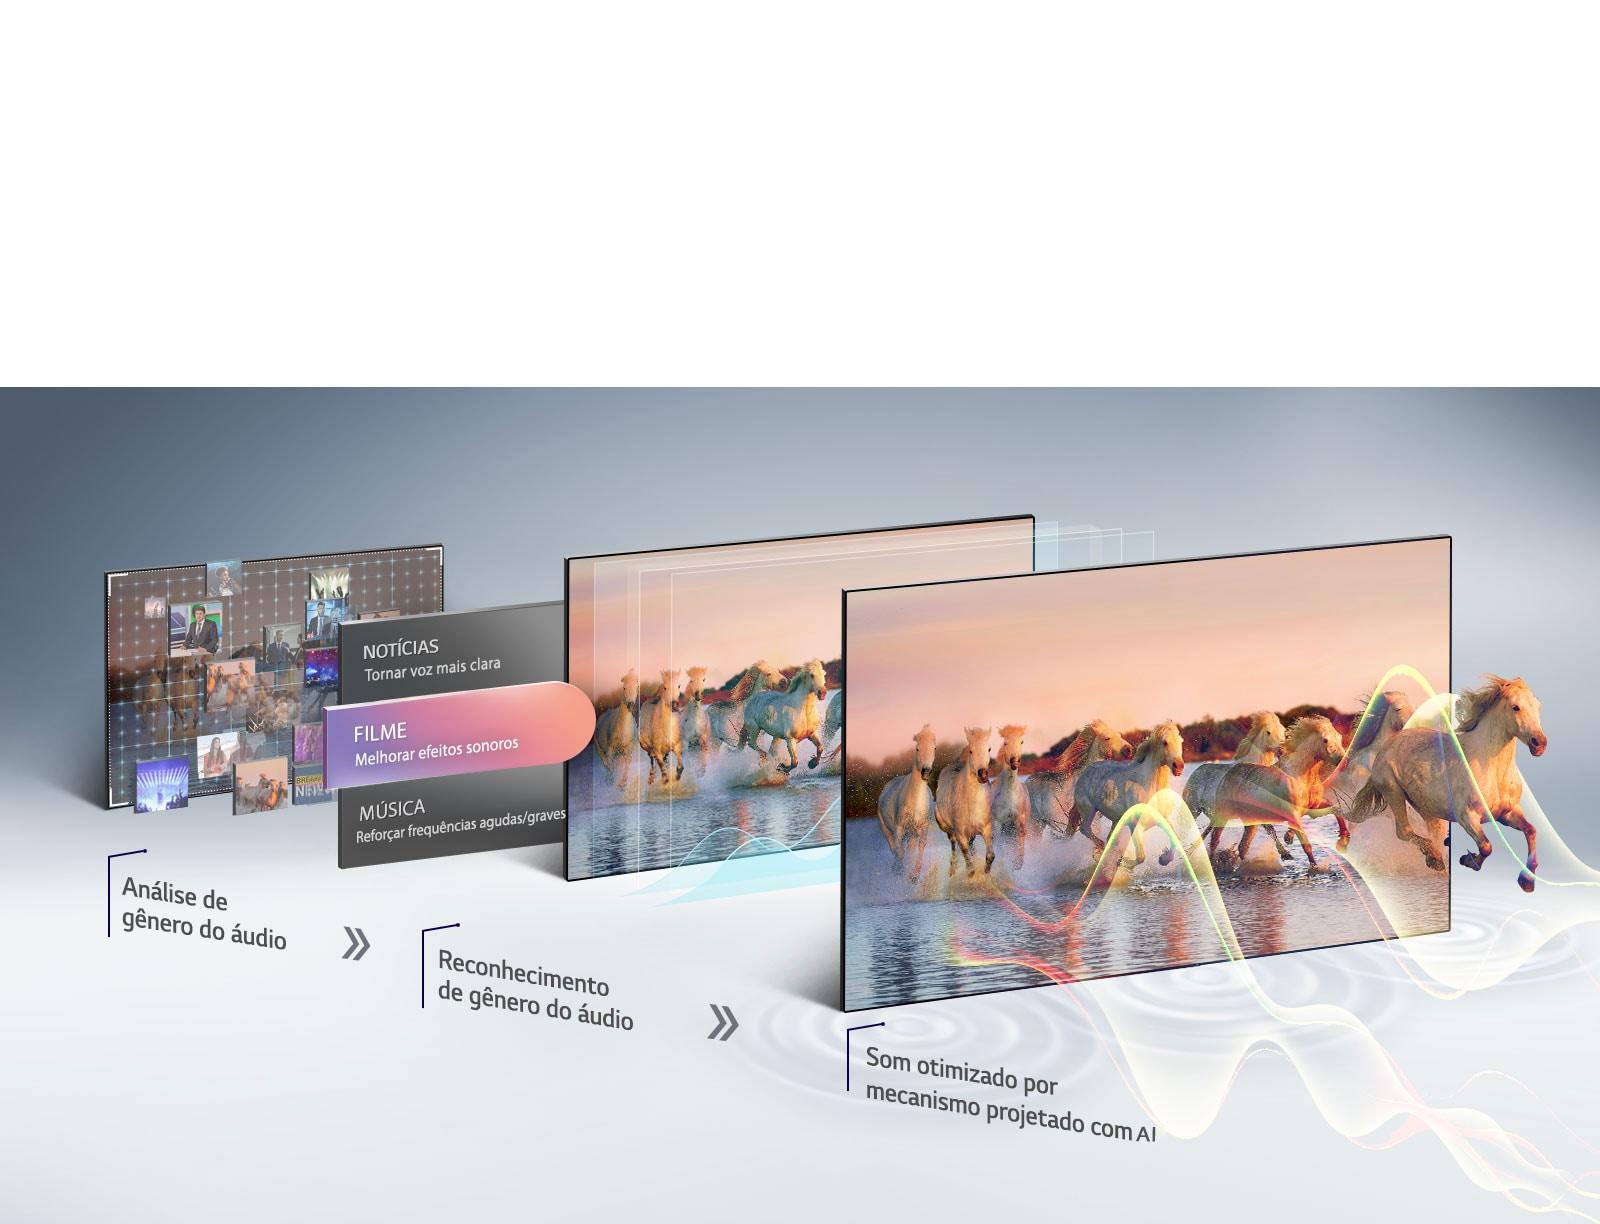 AI Sound O Deep Learning da LG e o processador α7